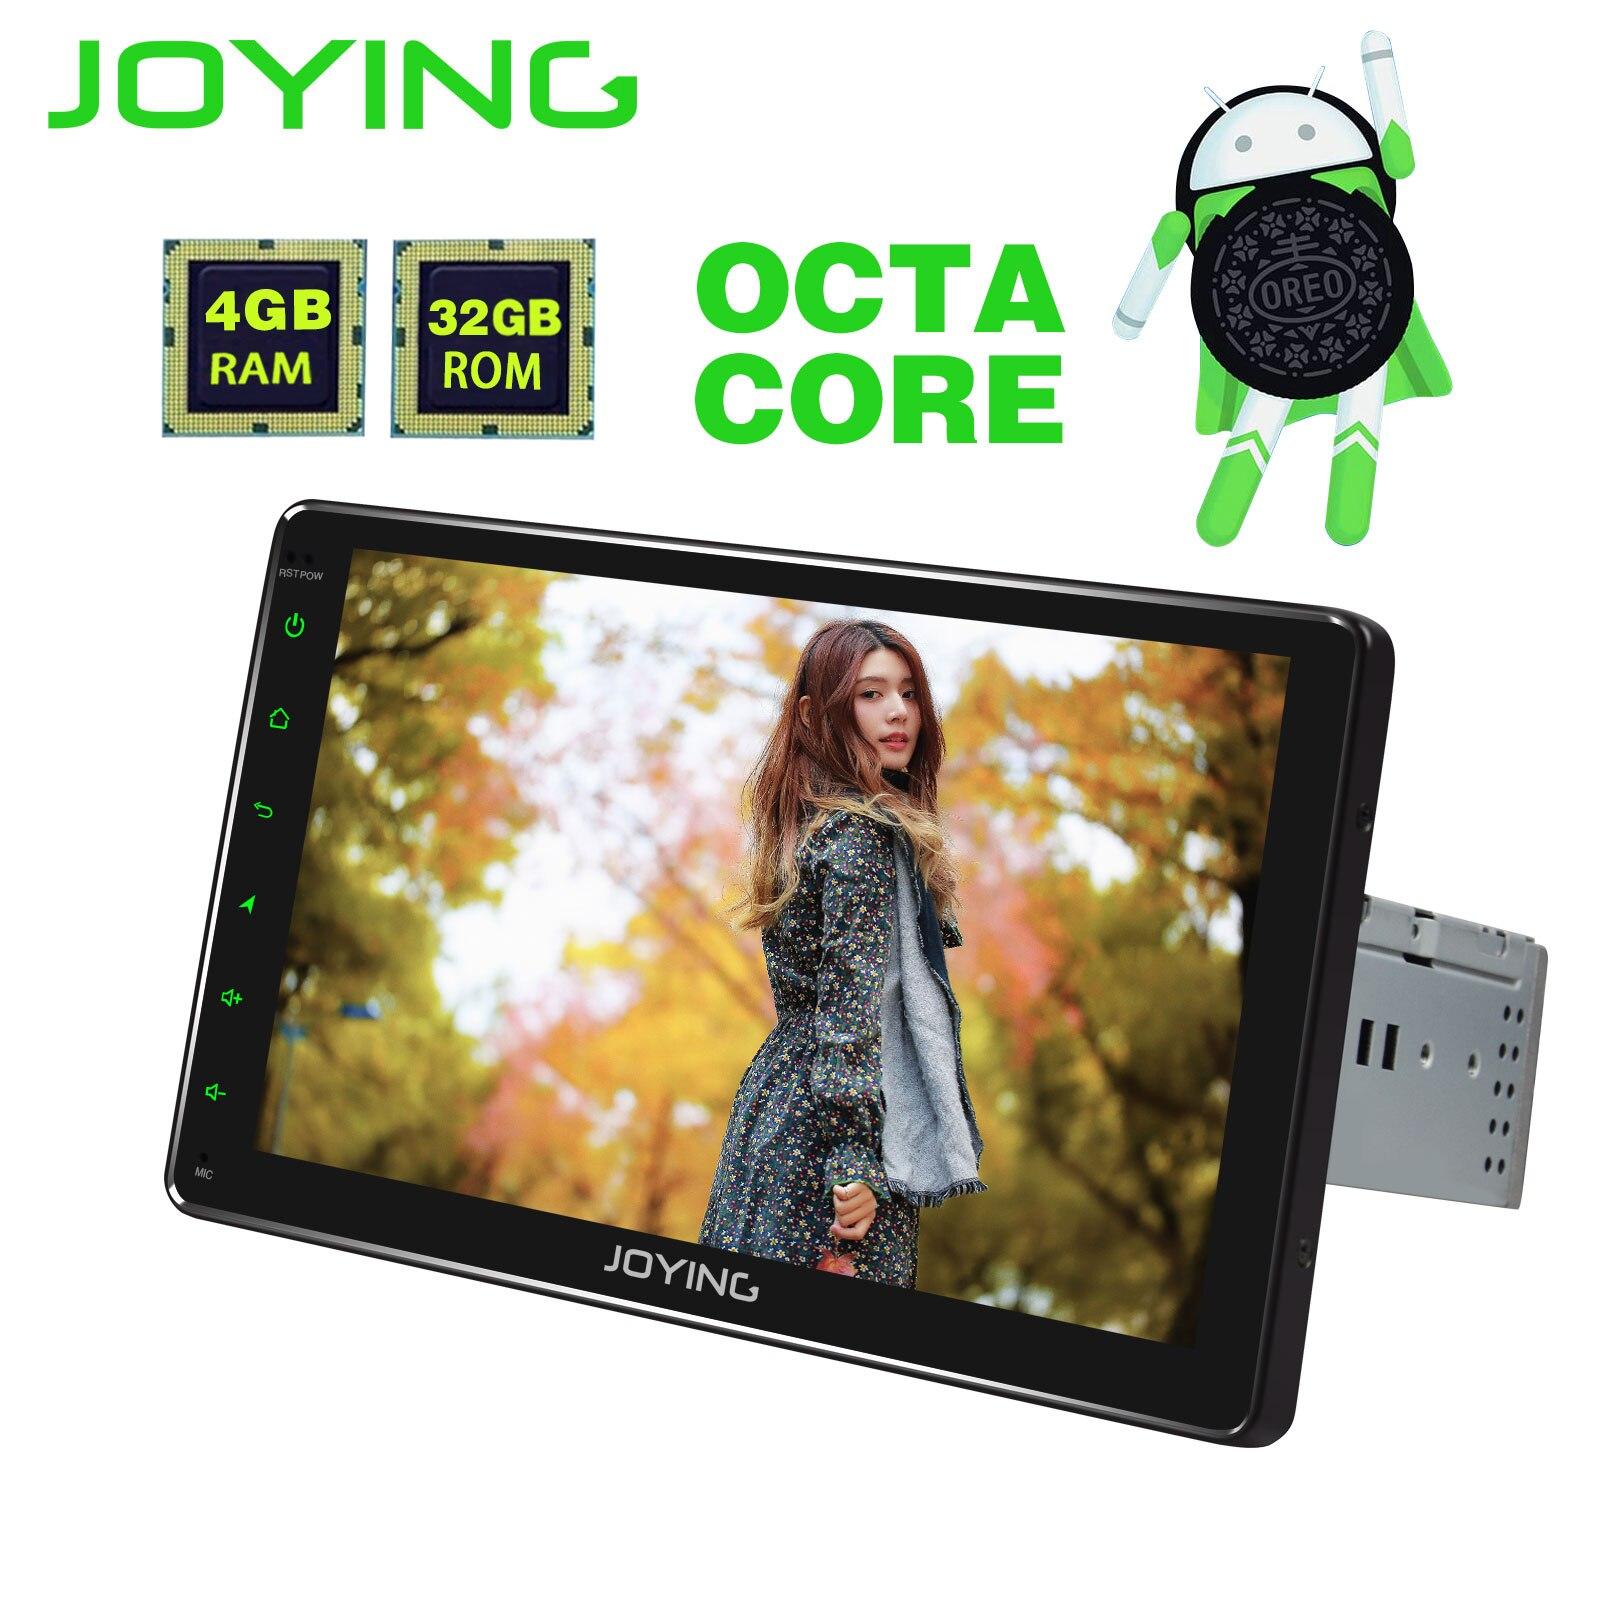 JOYING 4 GB + 32 GB Octa Núcleo Android 8.1 rádio do carro din único comando de voz DSP de áudio estéreo WI-FI unidade de cabeça GPS universal 9